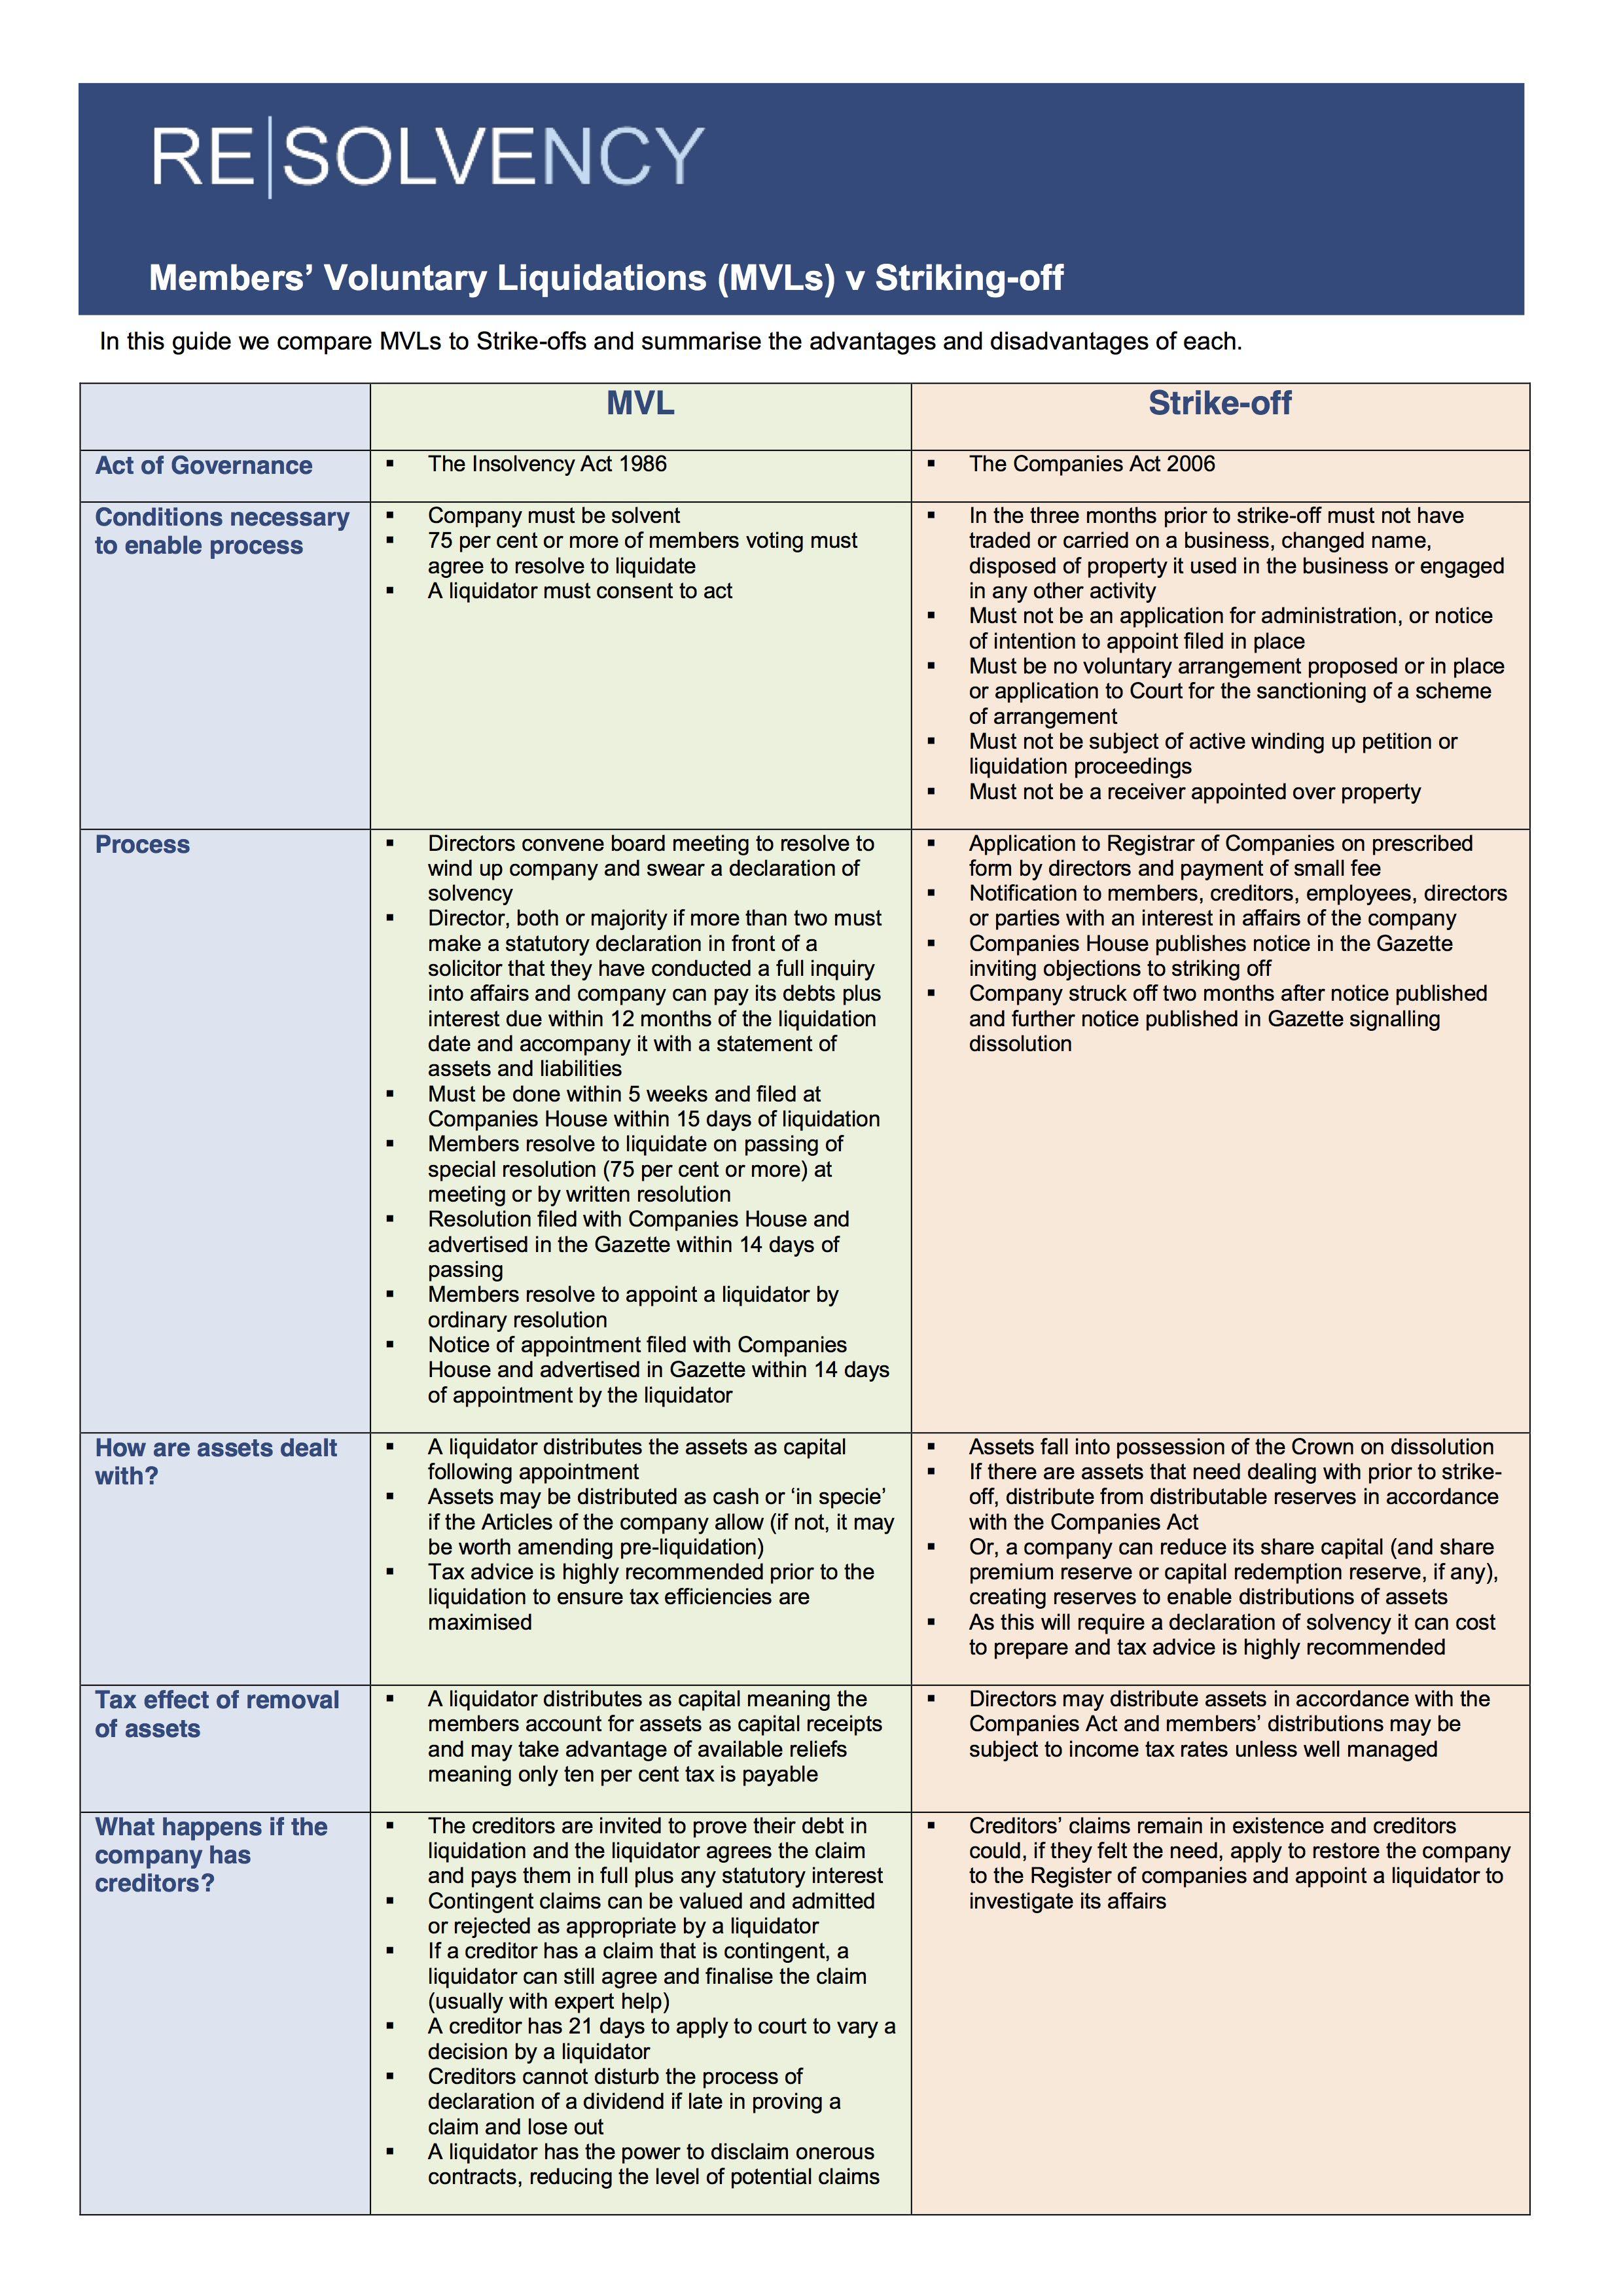 MVL v Strike-off Comparison - ReSolve (1)